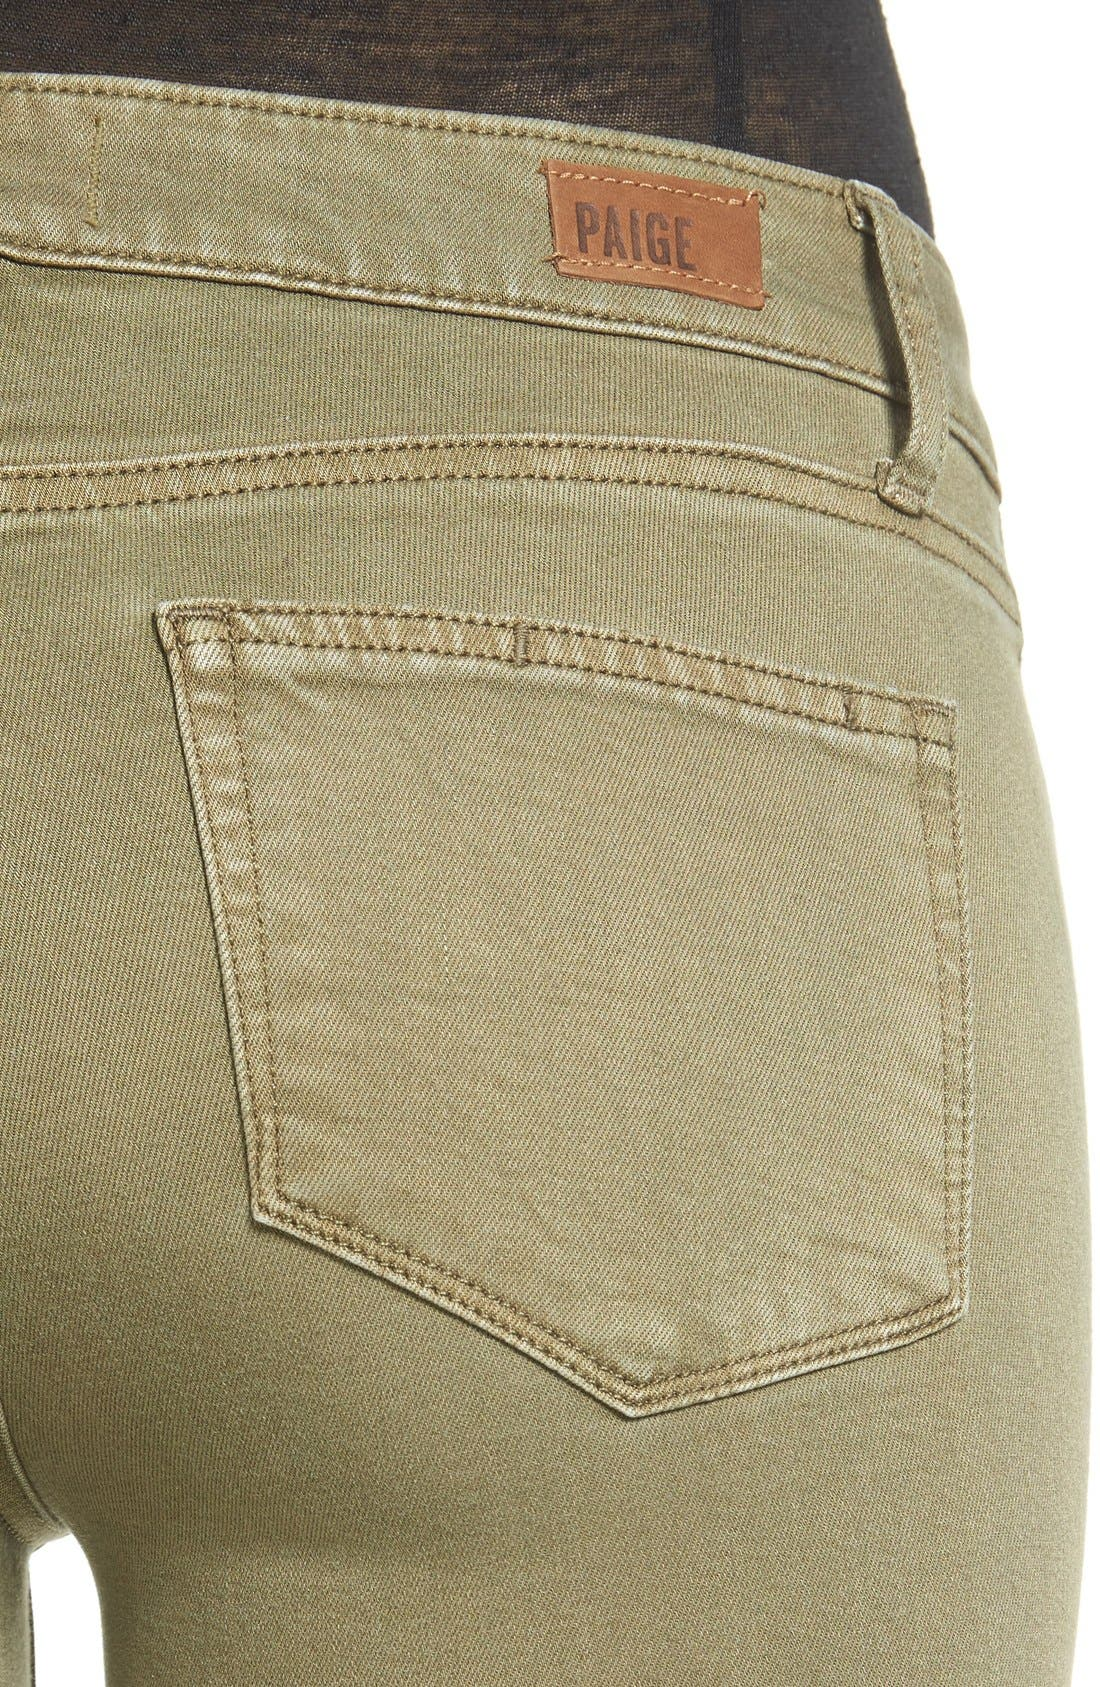 Transcend - Verdugo Ankle Skinny Jeans,                             Alternate thumbnail 3, color,                             Sahara Green